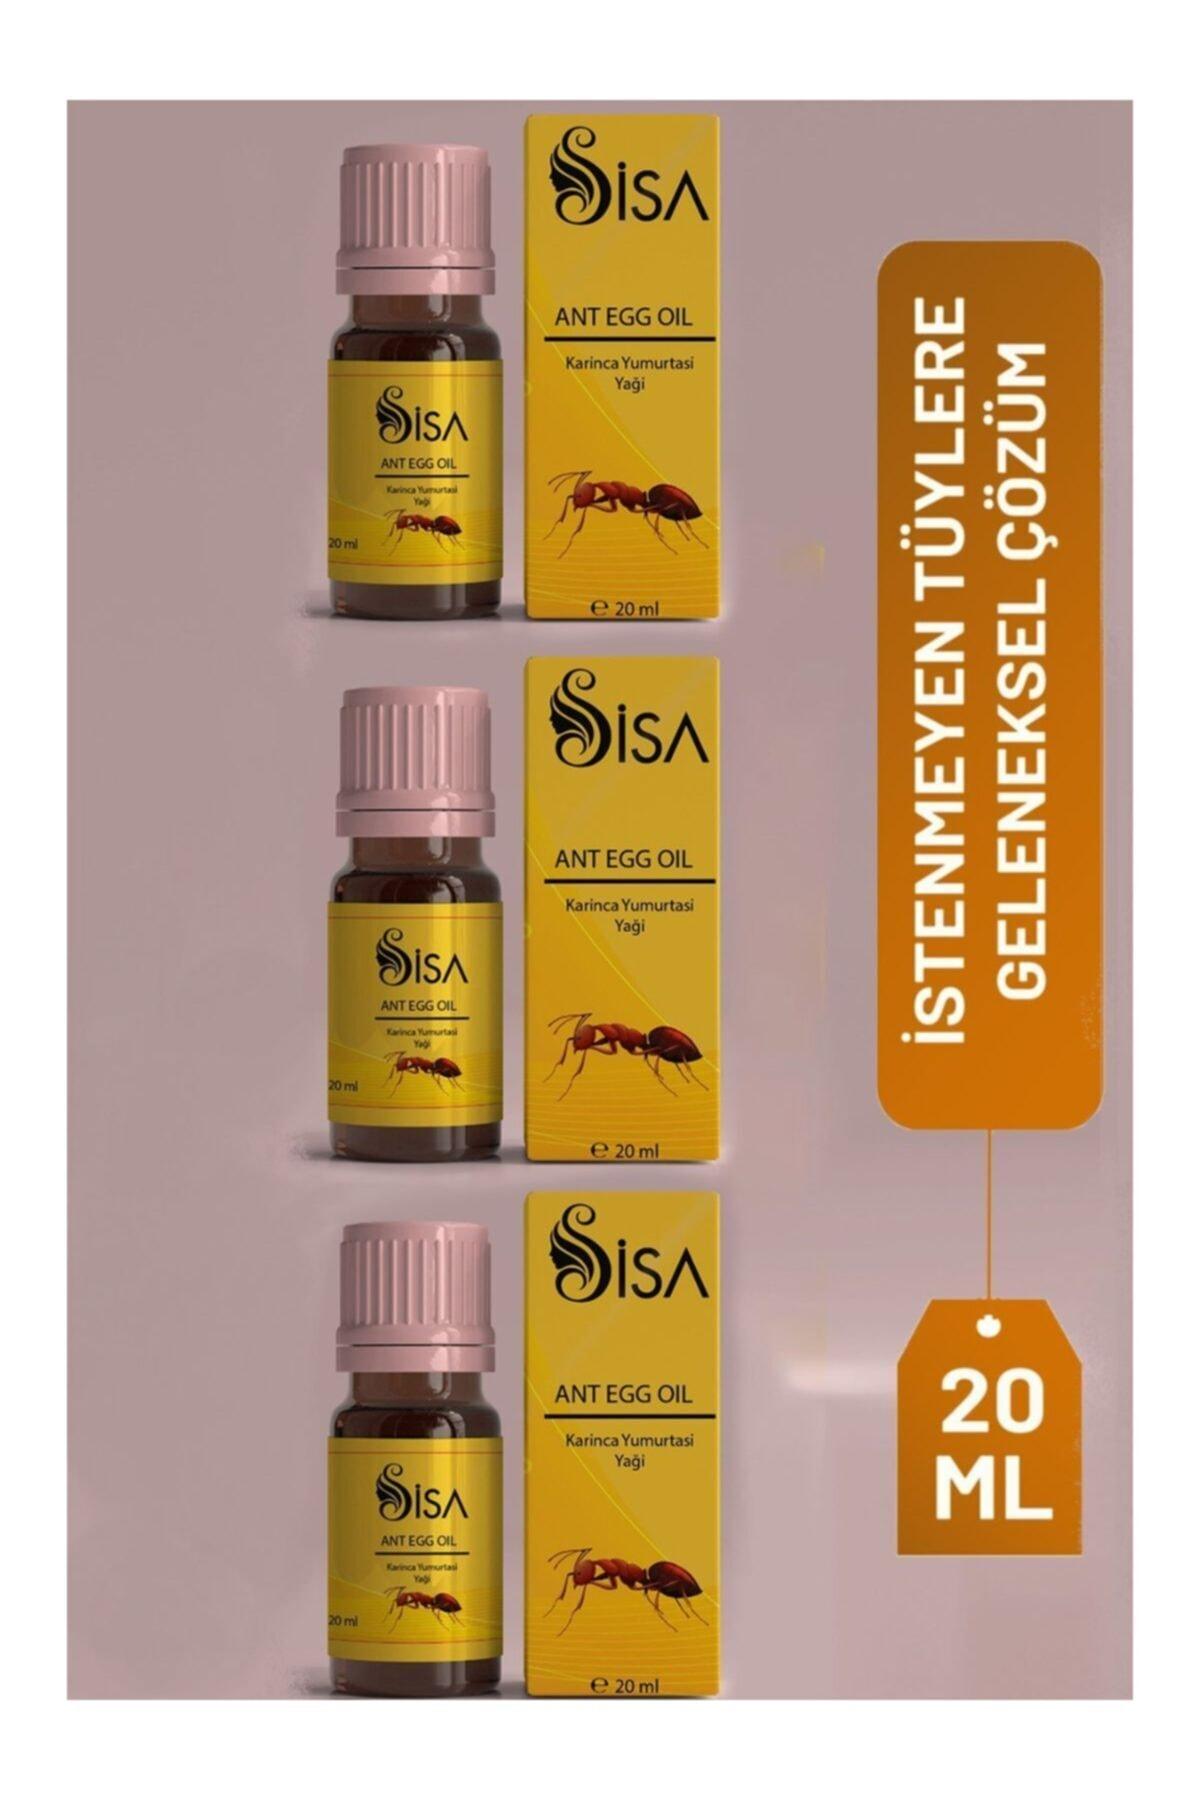 3 Adet Karınca Yumurtası Yağı 20ml/ Egg Oil 20ml (mt-maqya)